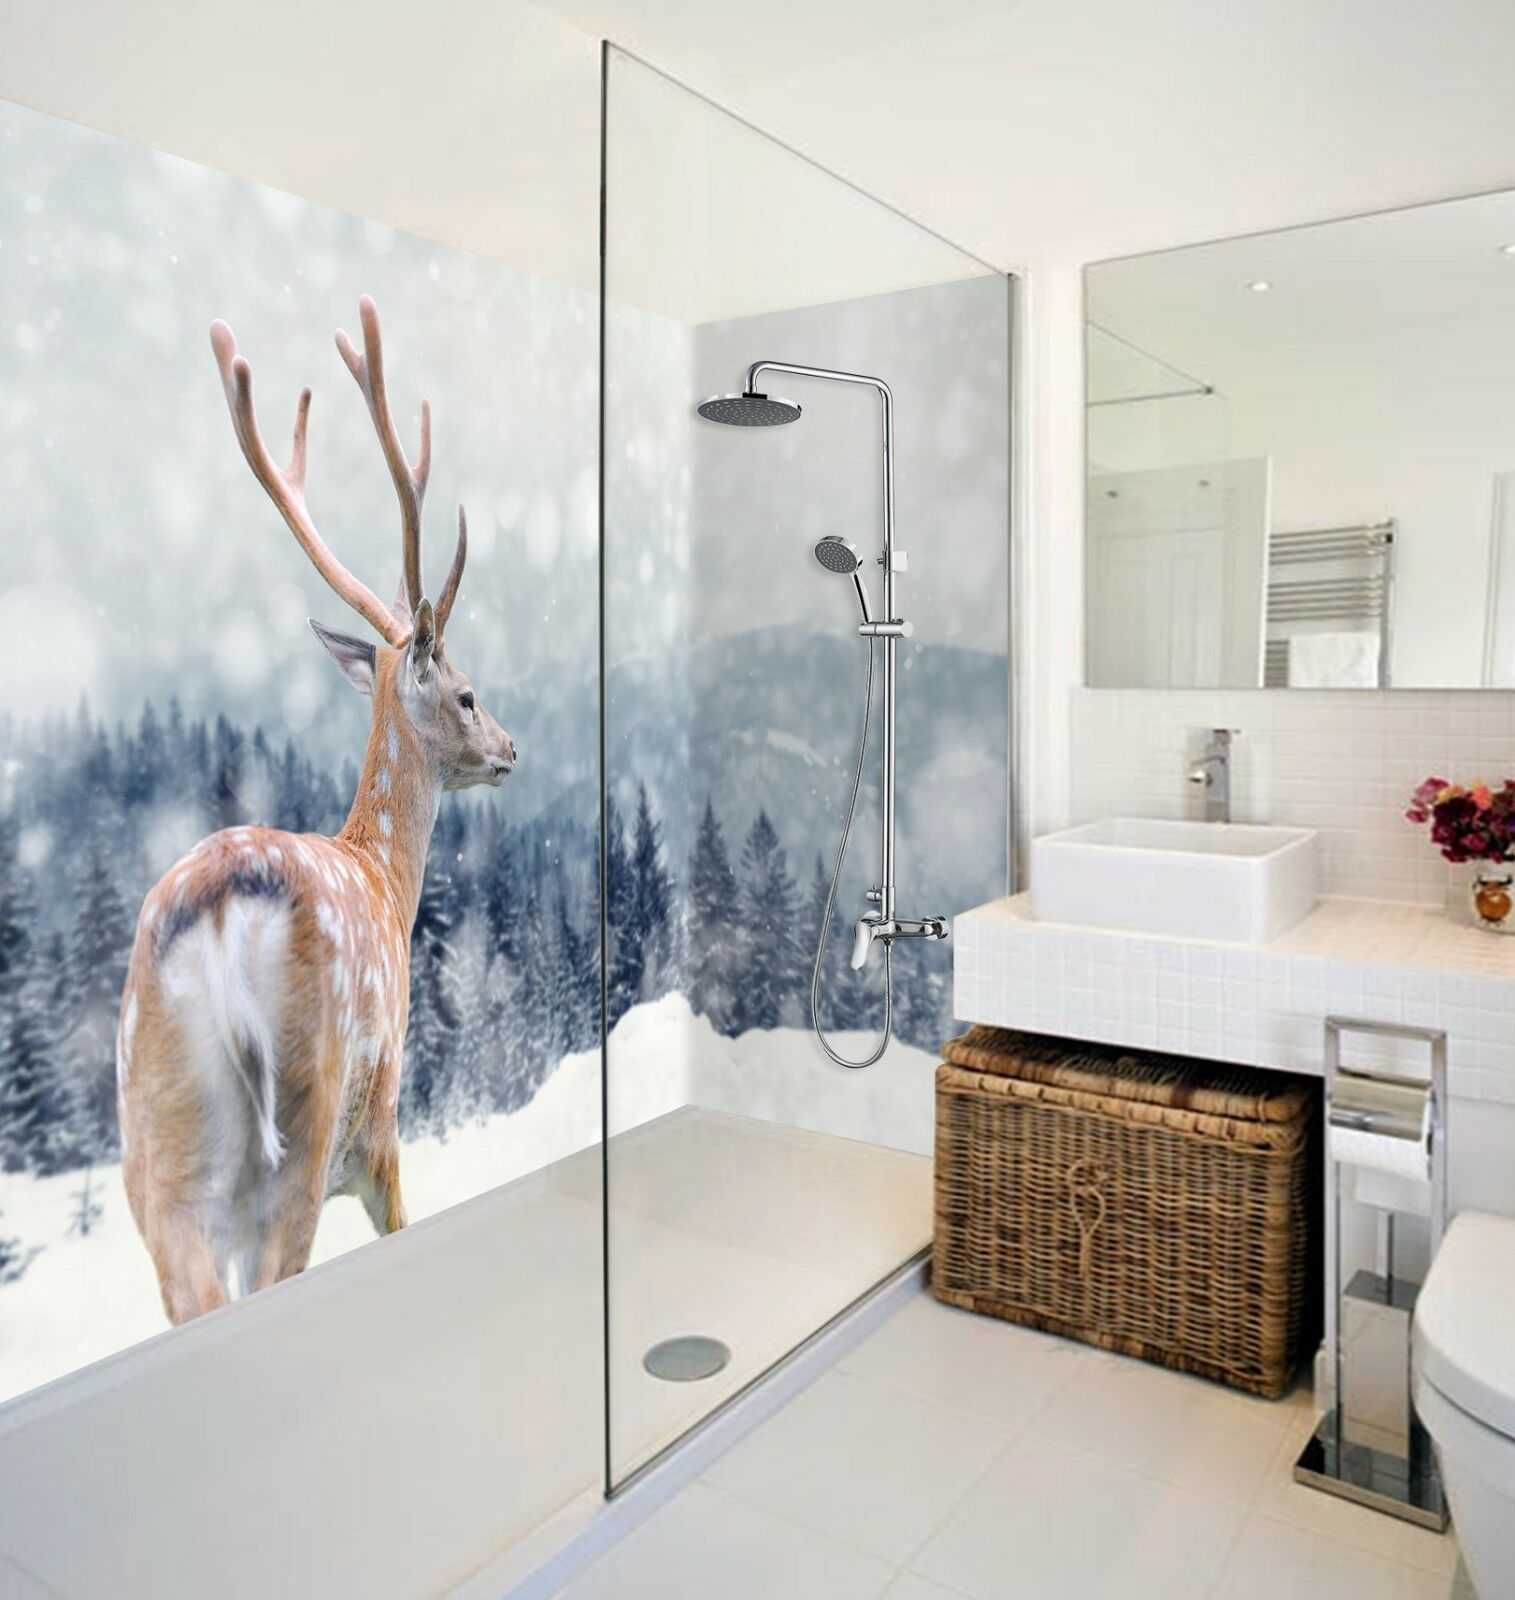 3D Snow Sika Deer 64 WallPaper Bathroom Print Decal Wall Deco AJ WALLPAPER AU